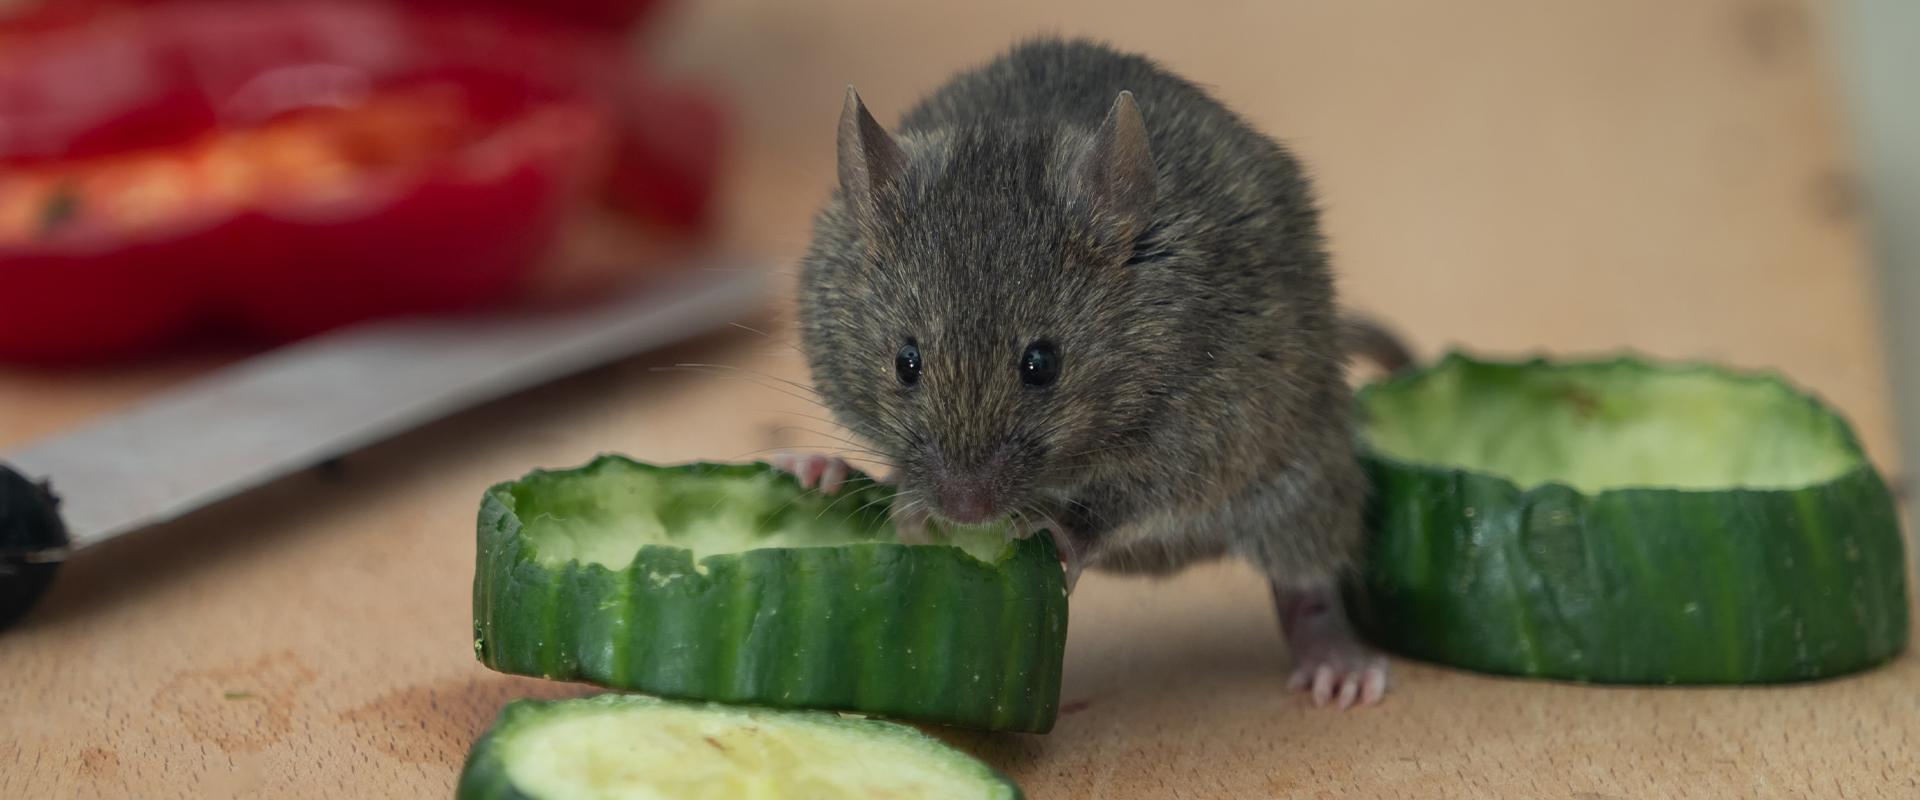 rodent eating vegetables